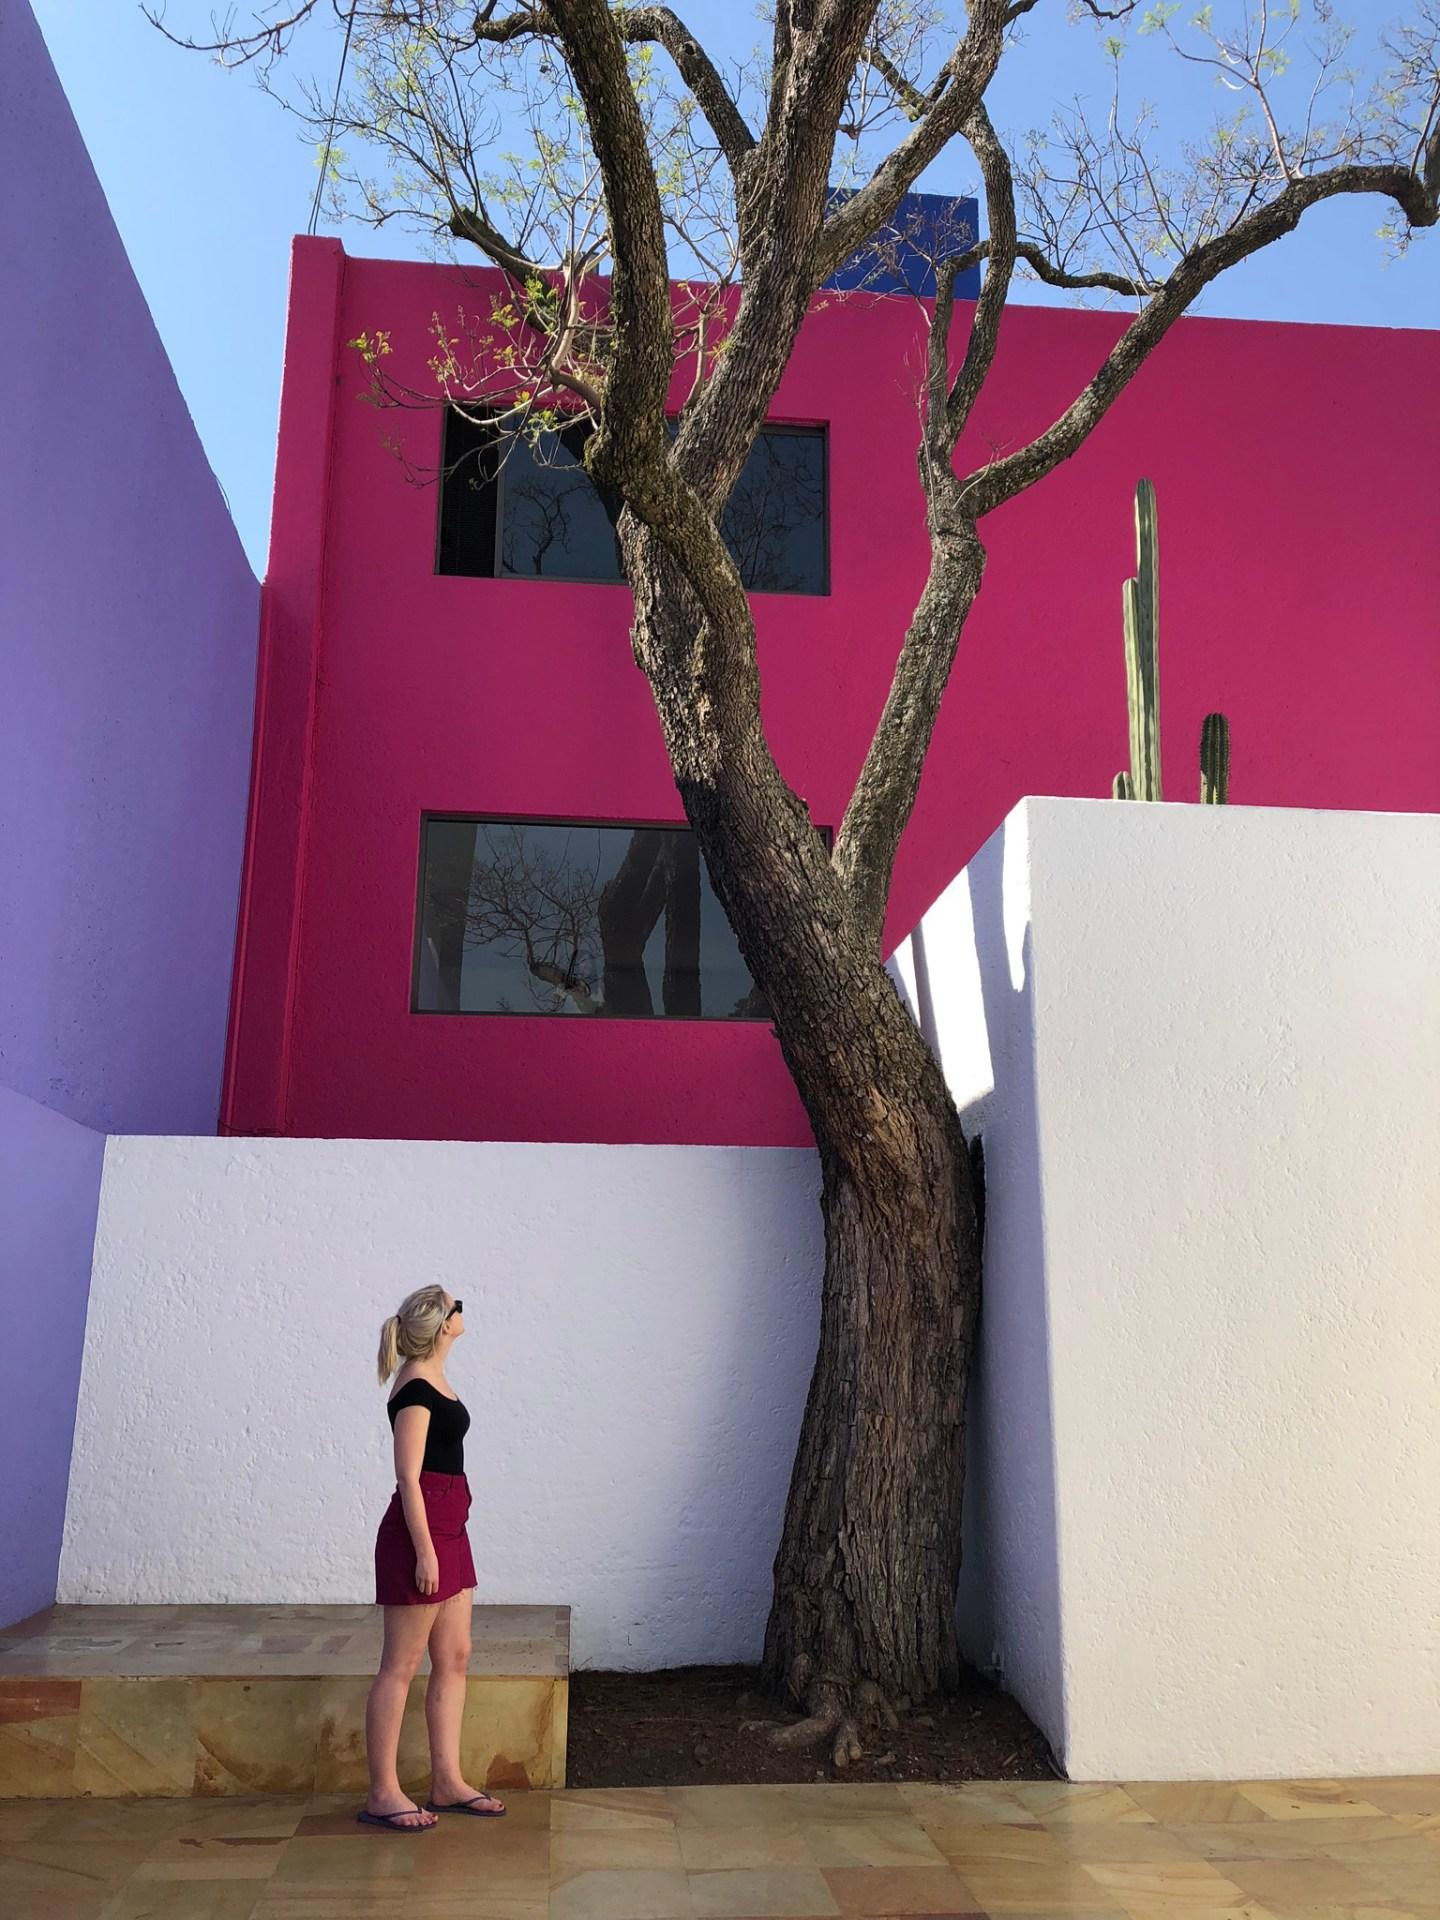 Laura at Casa Gilardi